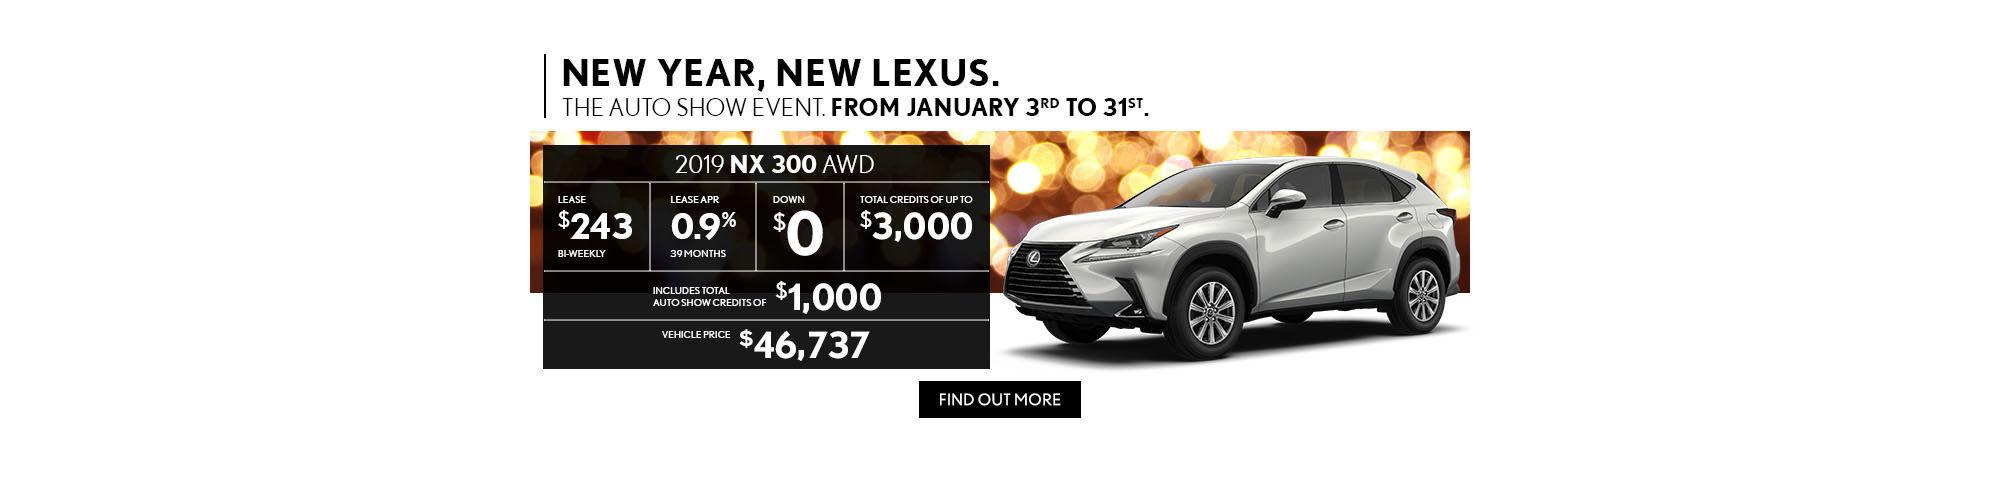 The Auto Show Sales Event